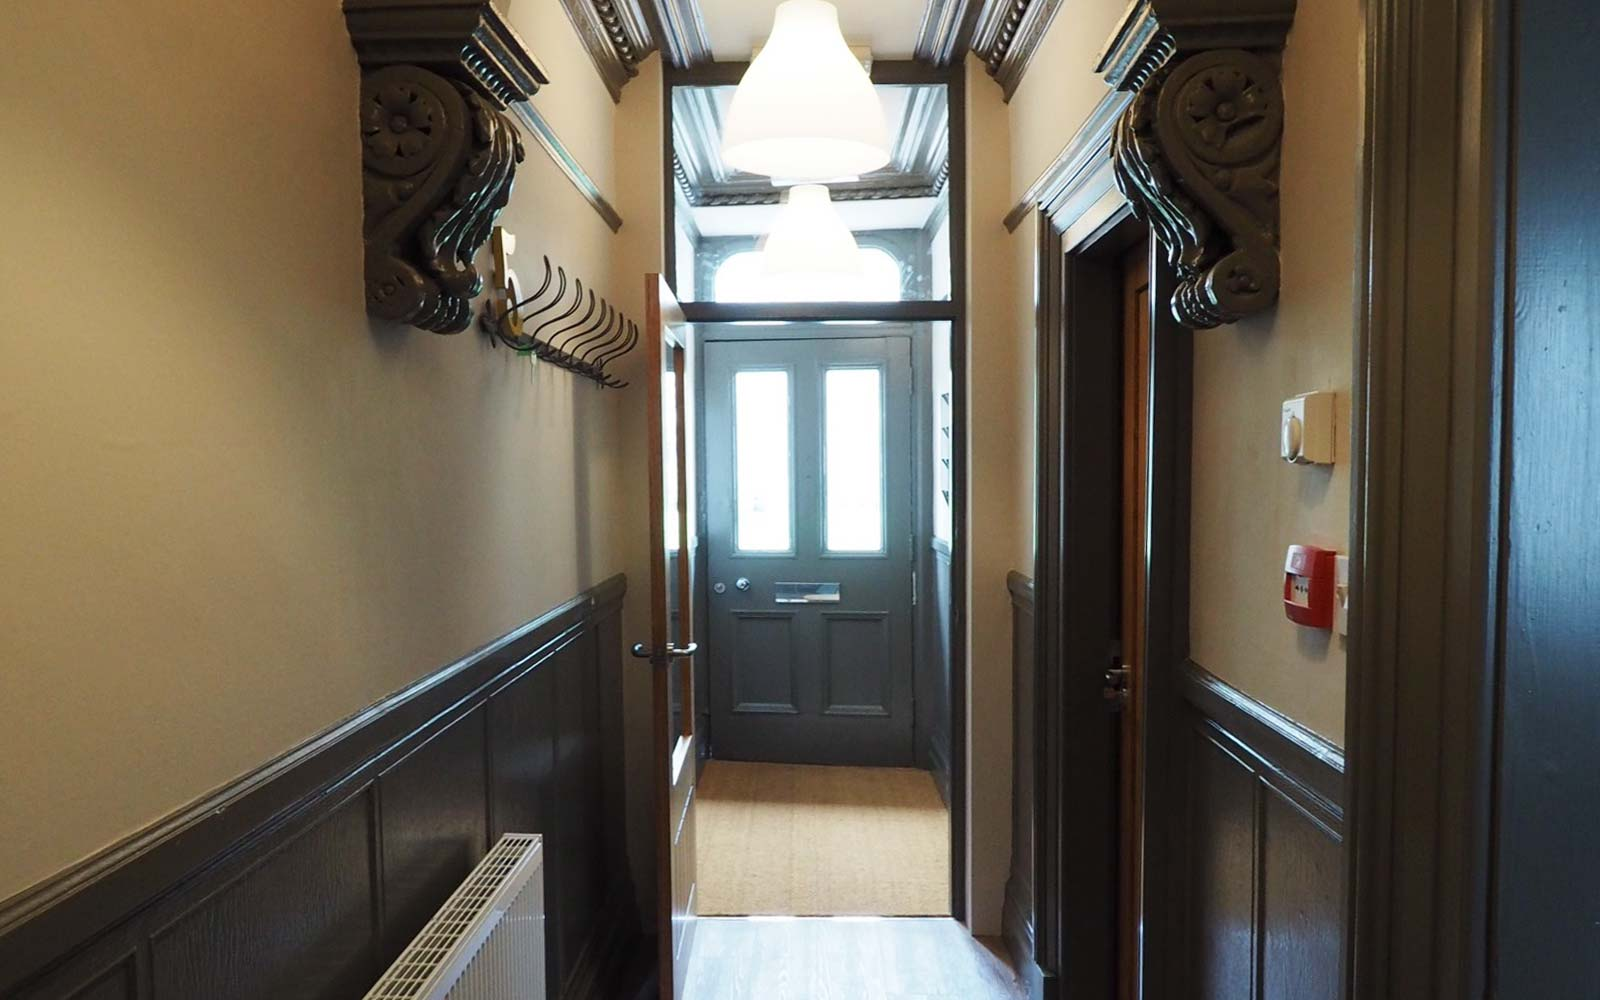 h properties luxury kendal accommodation